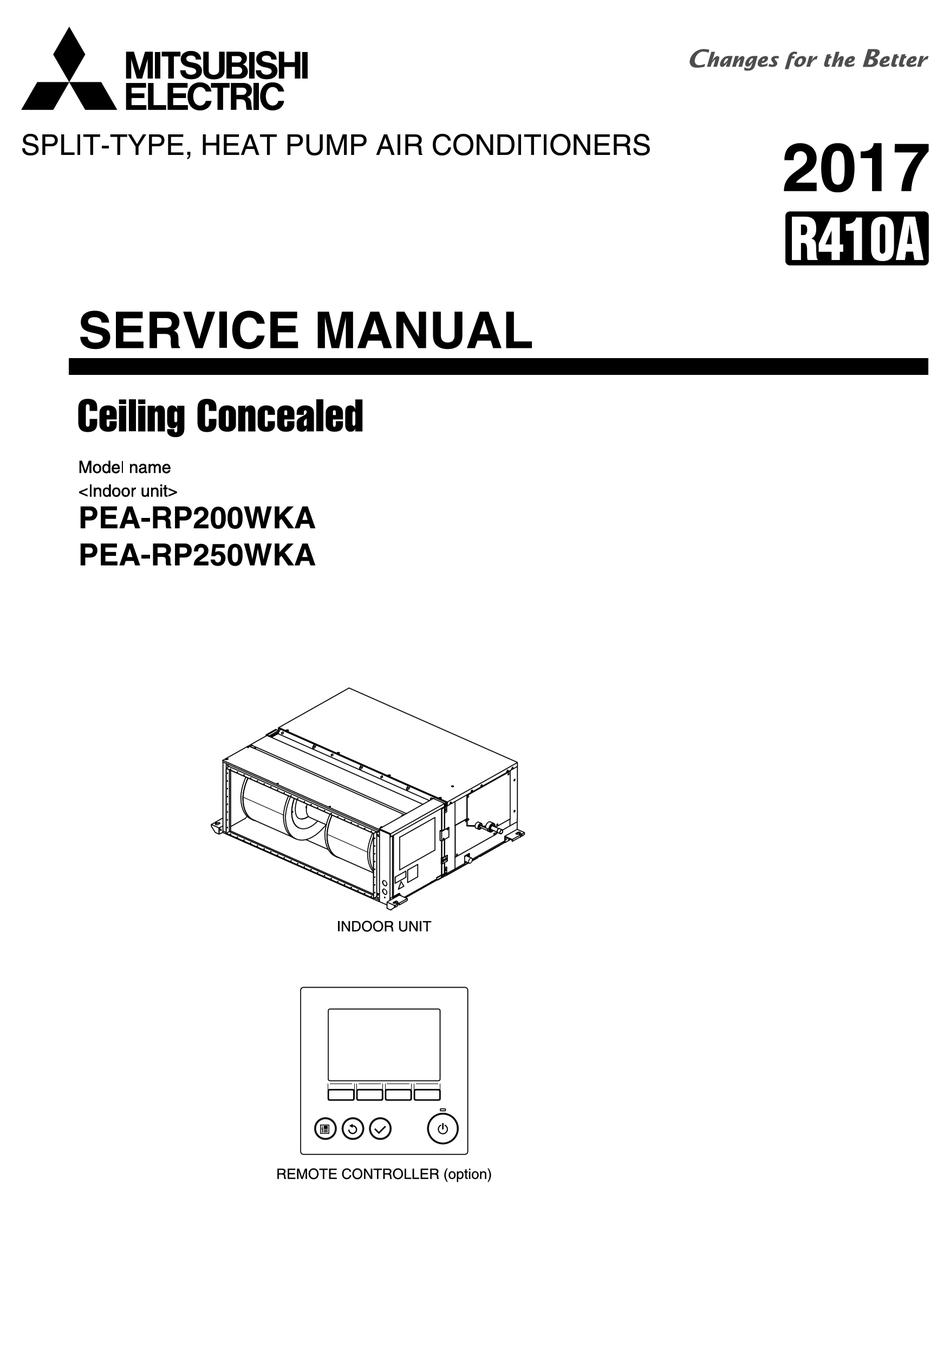 MITSUBISHI ELECTRIC PEA-RP200WKA SERVICE MANUAL Pdf